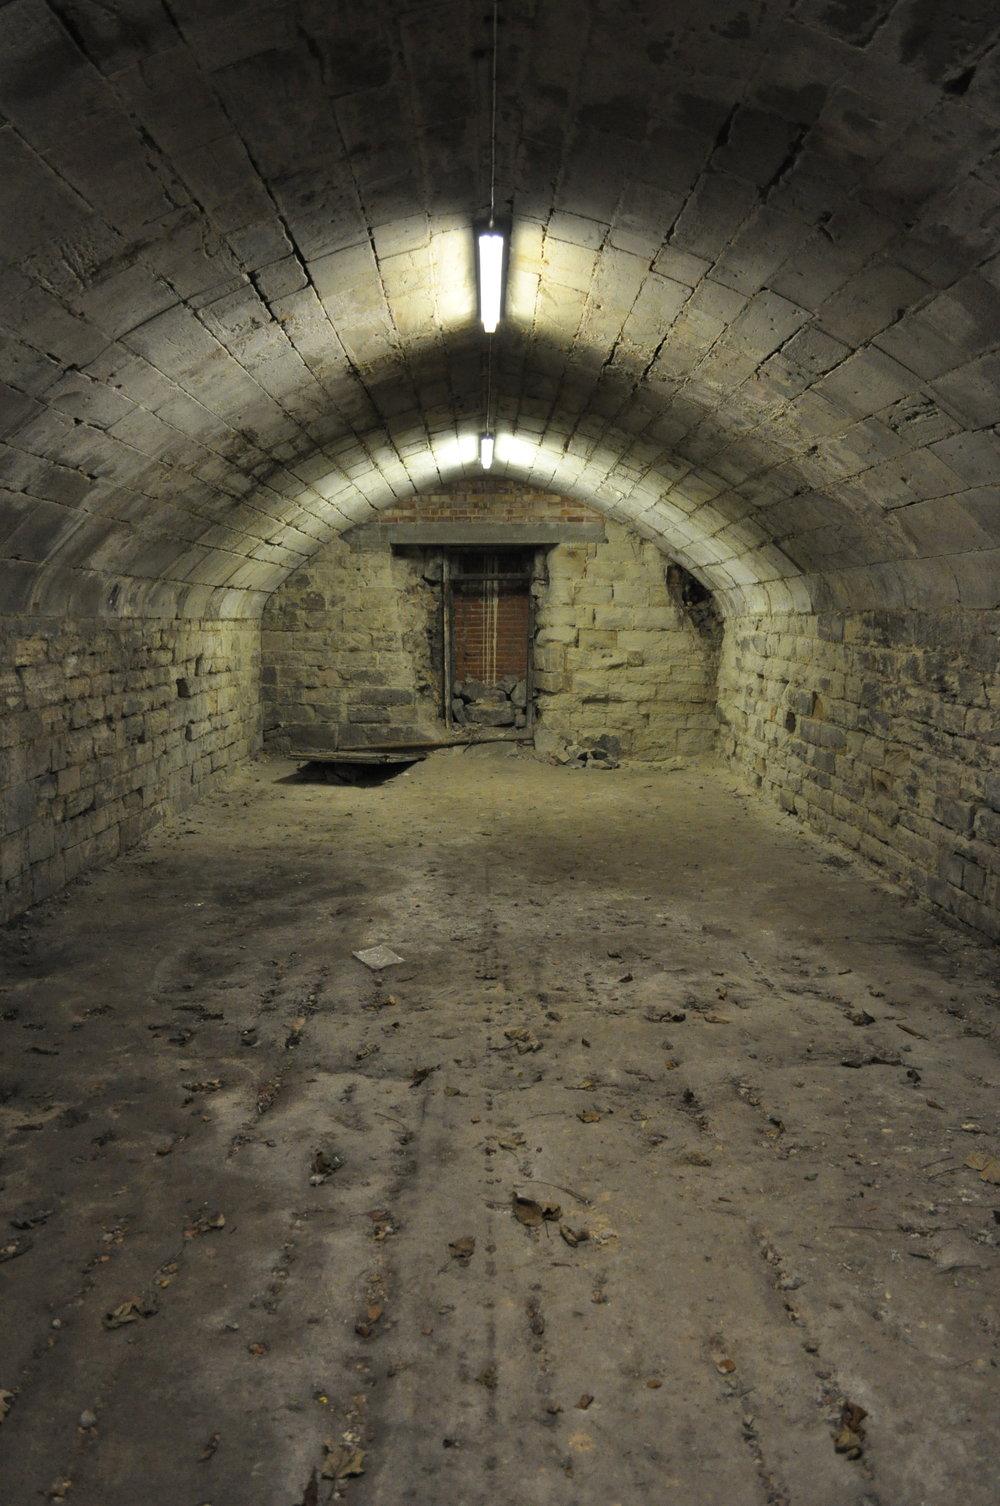 John_o_gaunts_cellar_005.jpg